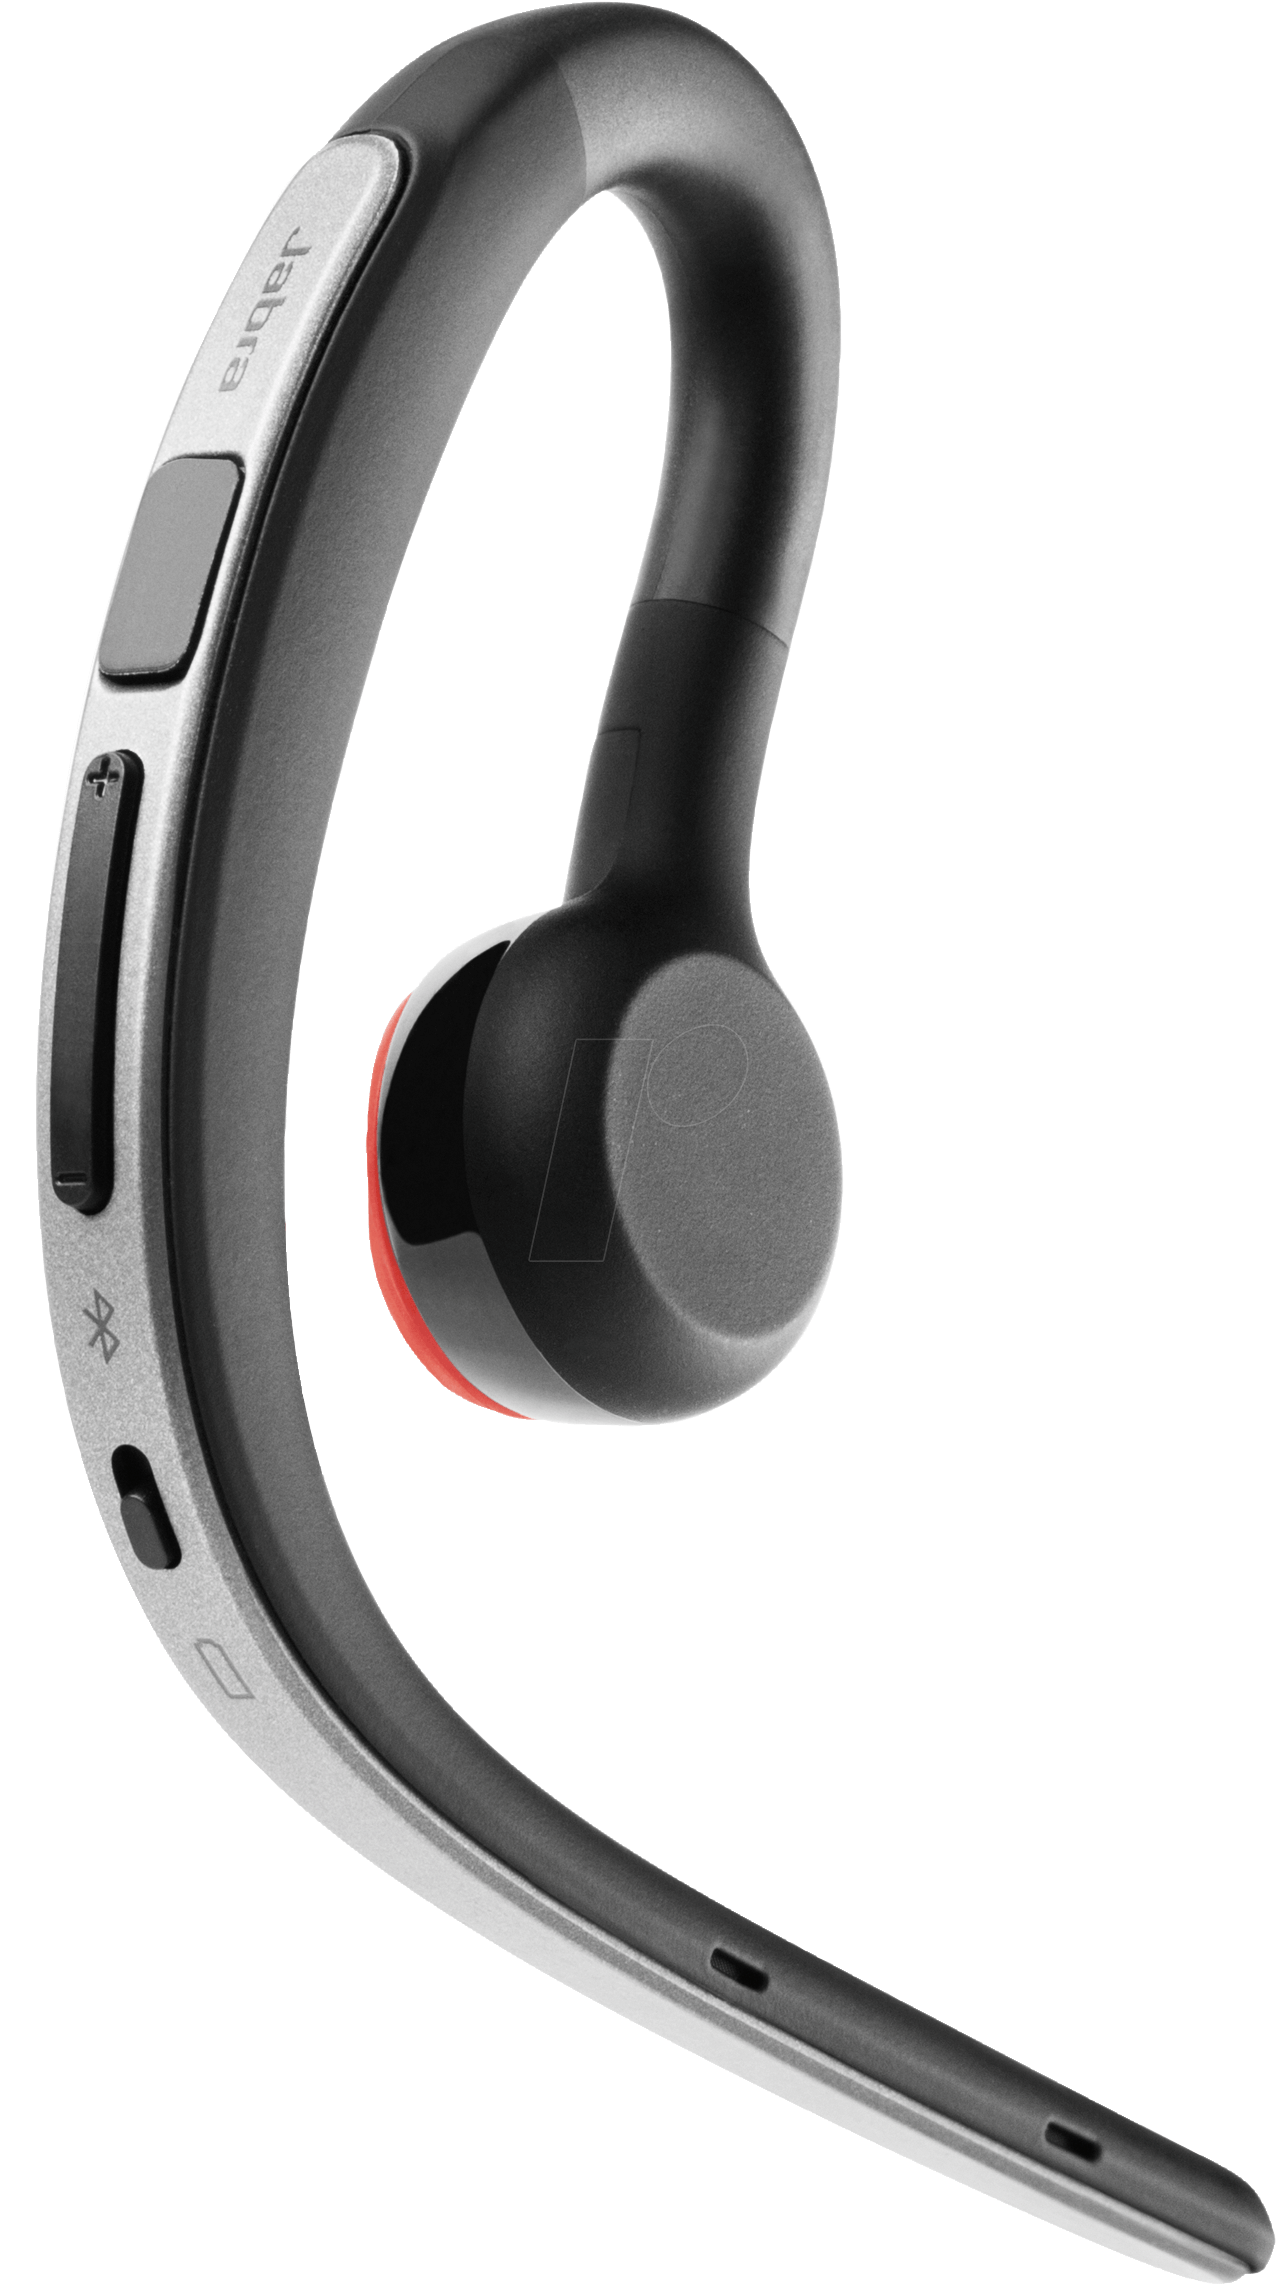 jabra storm headset in ear bluetooth schwarz silber. Black Bedroom Furniture Sets. Home Design Ideas